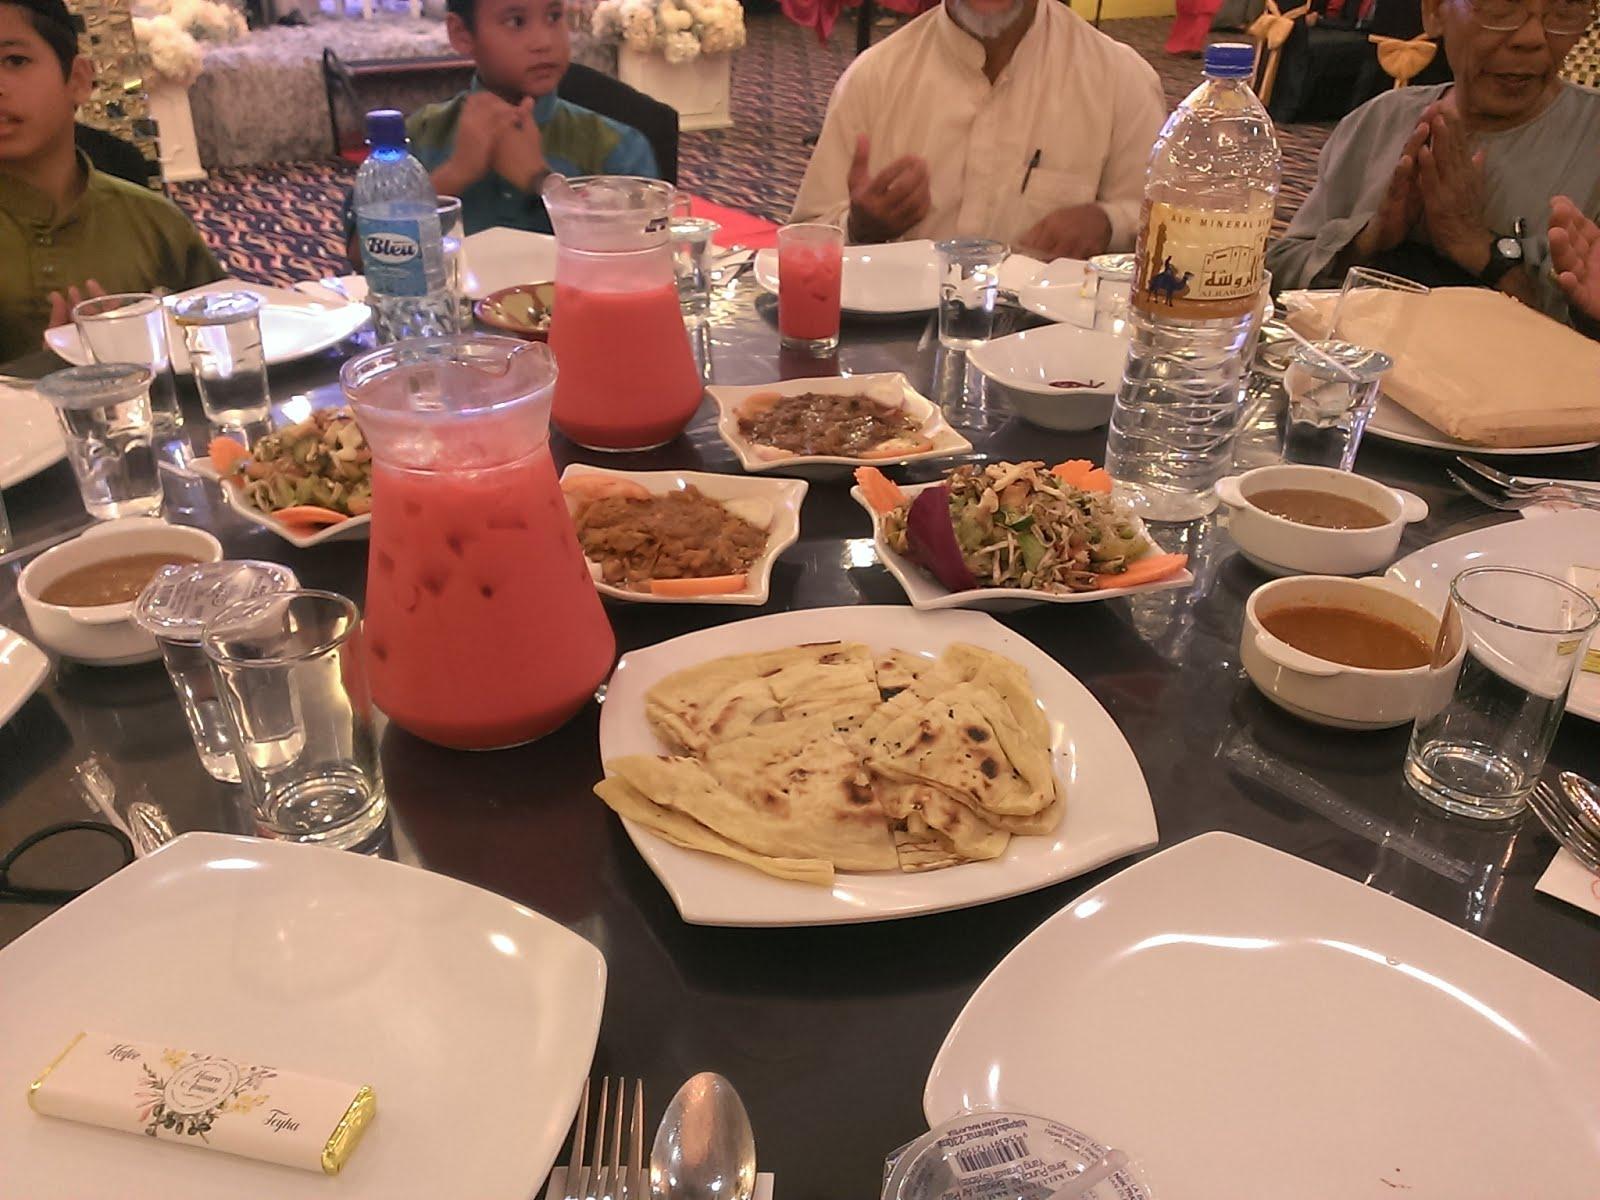 Al - Rawsha Restaurant - Shah Alam, Selangor